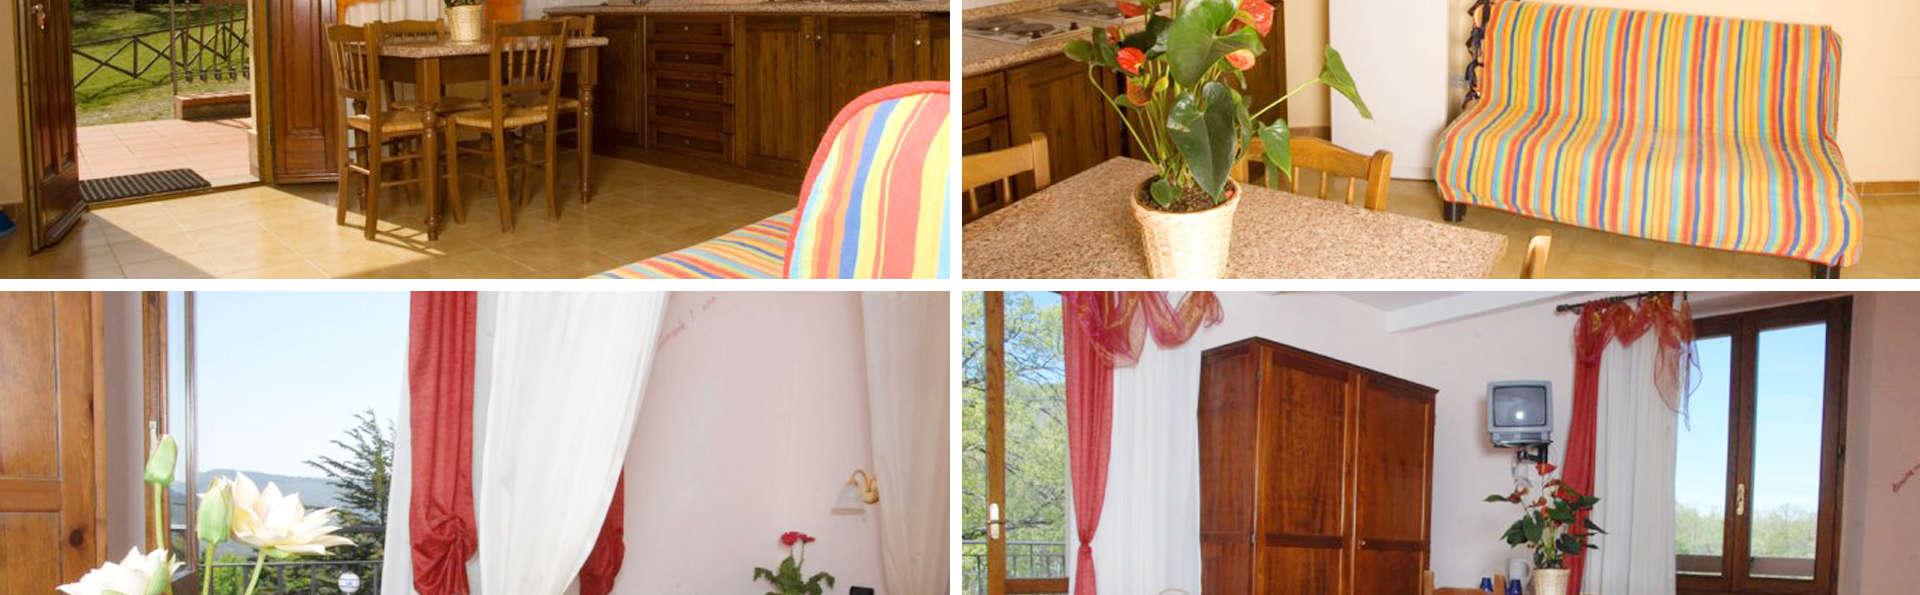 Hotel Residence Sant'Uberto - edit_collage2.jpg